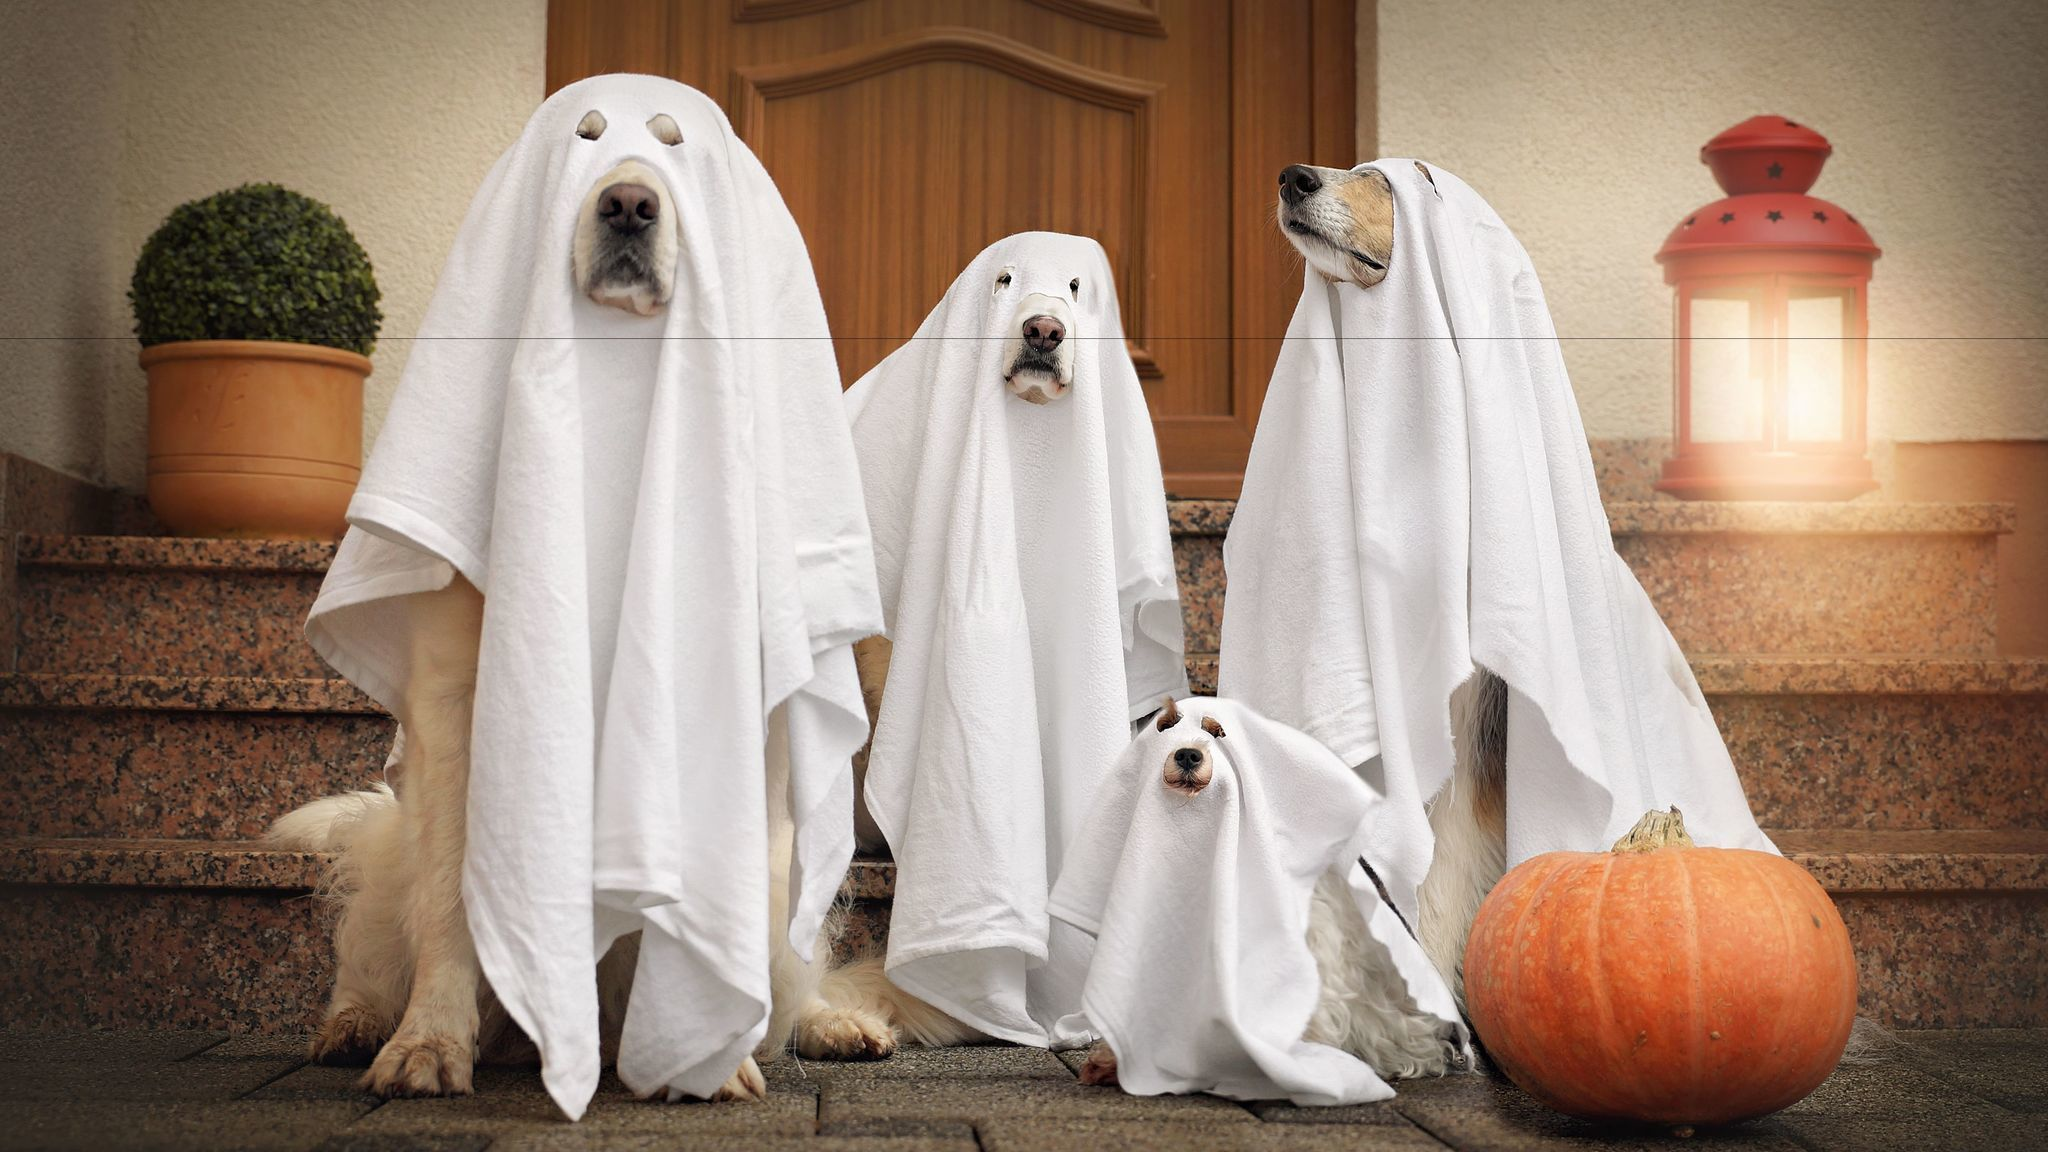 Dog costumes: Halloween cuteness overload